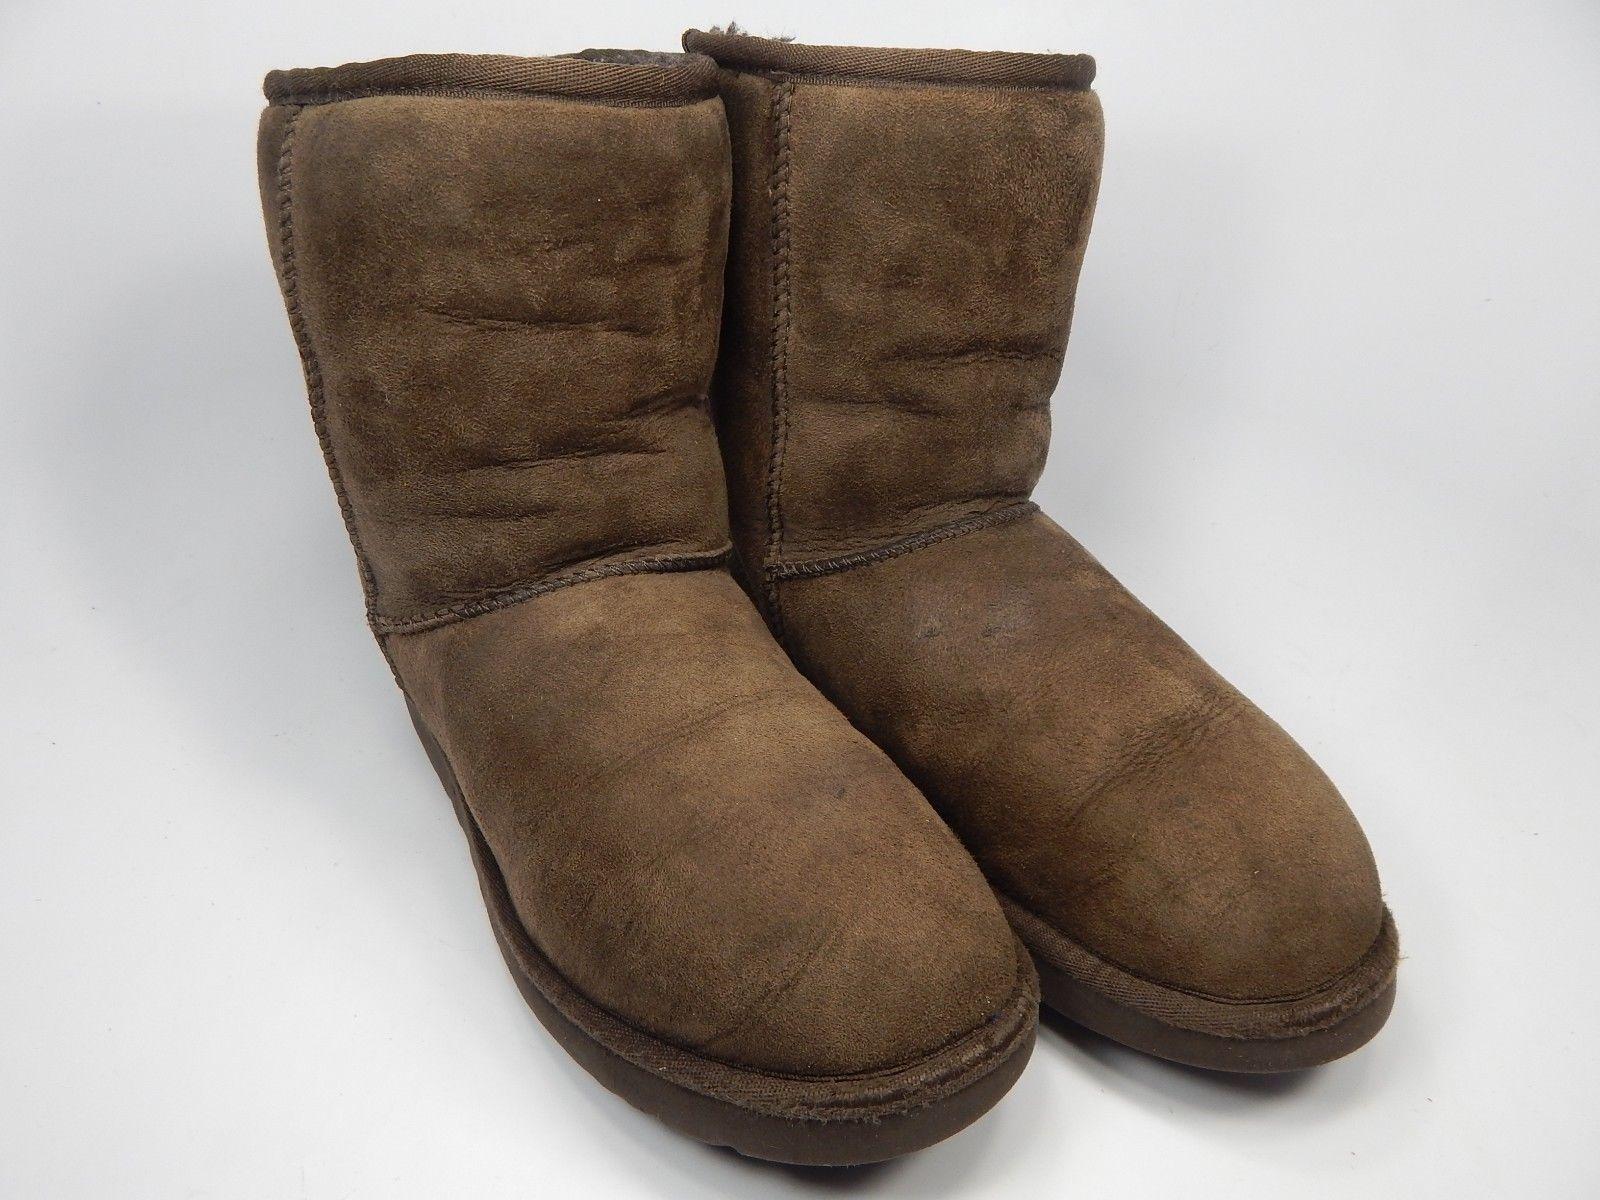 e7ceb3399a UGG Australia Classic Short Sheepskin Brown and 50 similar items. S l1600